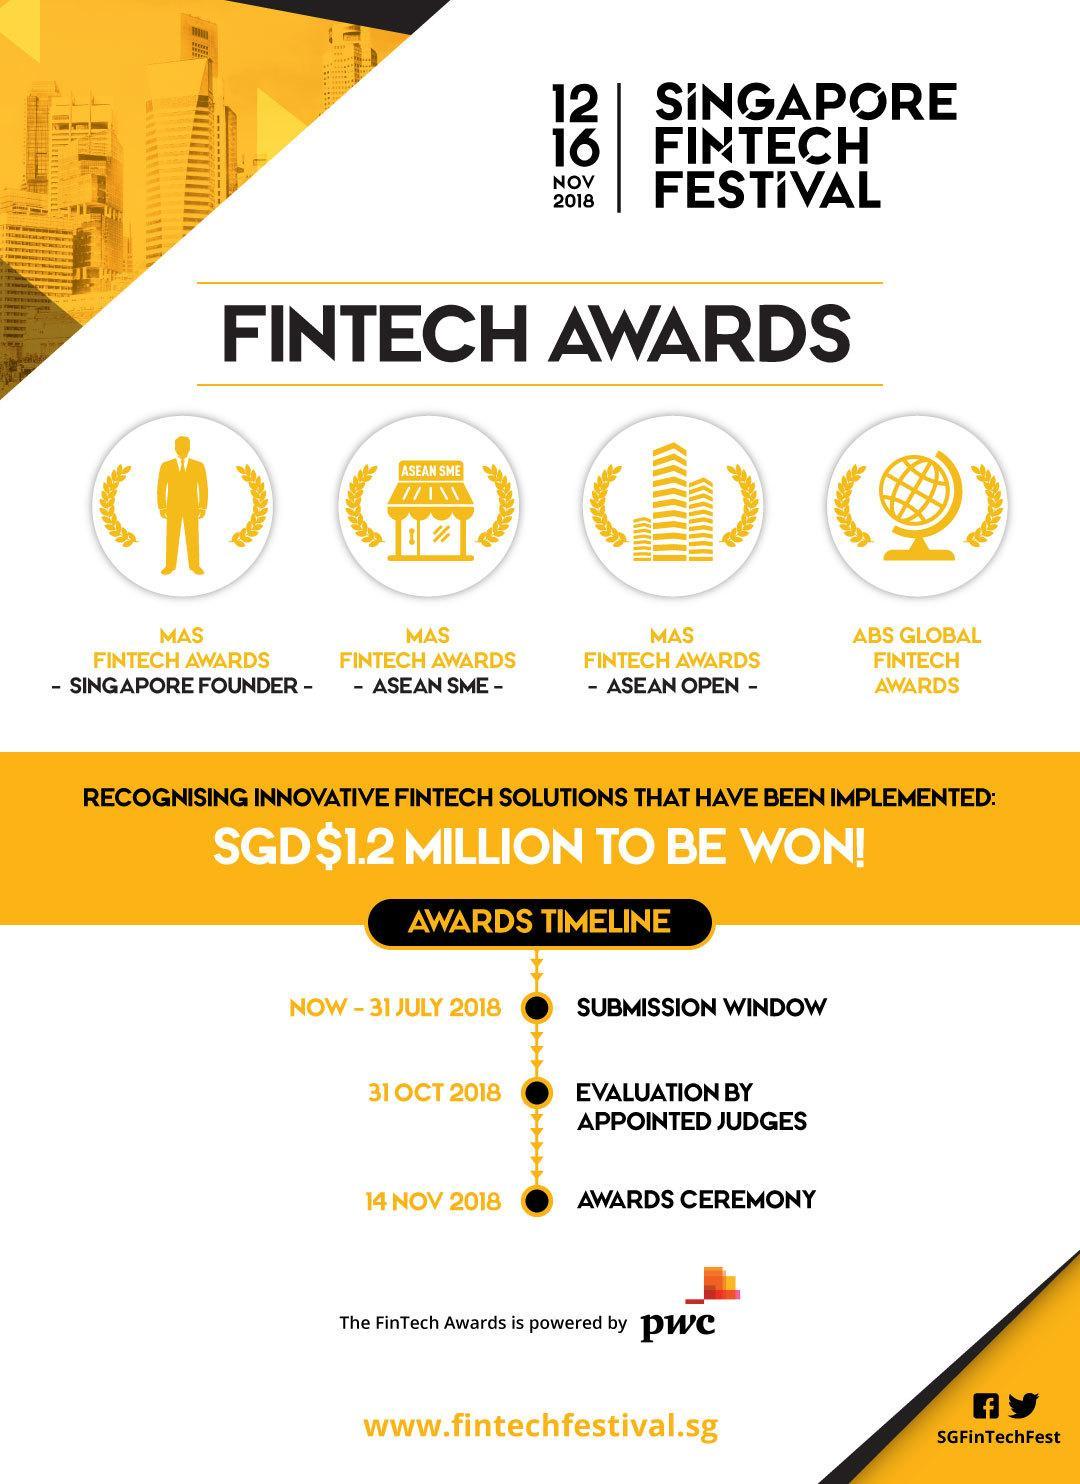 Singapore Fintech Awards 2018